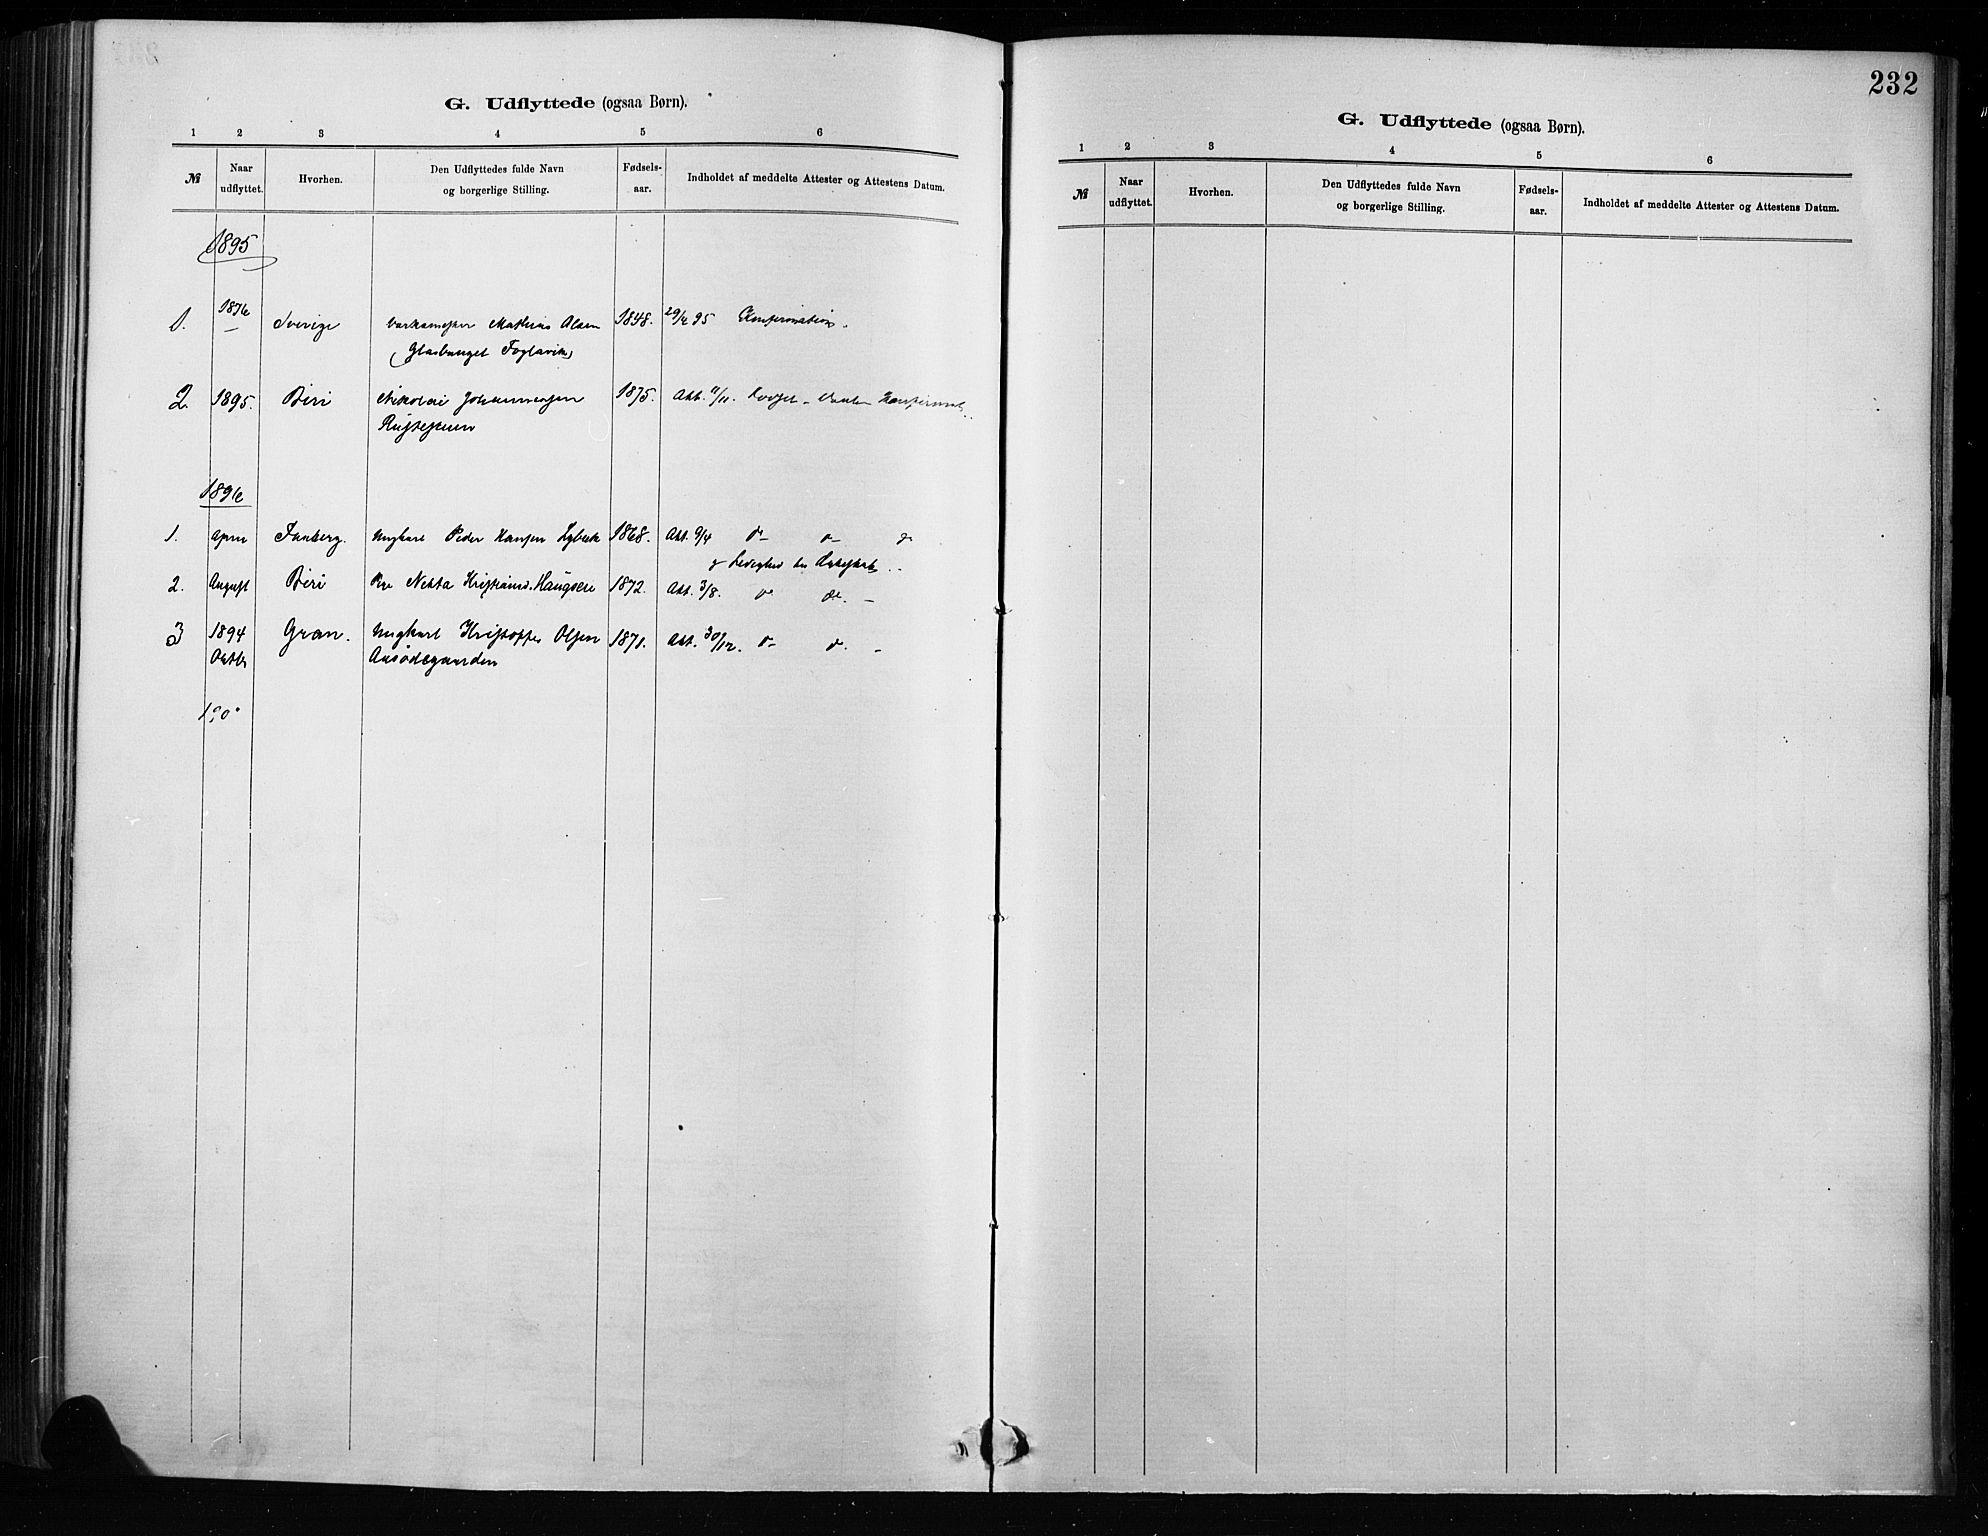 SAH, Nordre Land prestekontor, Ministerialbok nr. 4, 1882-1896, s. 232